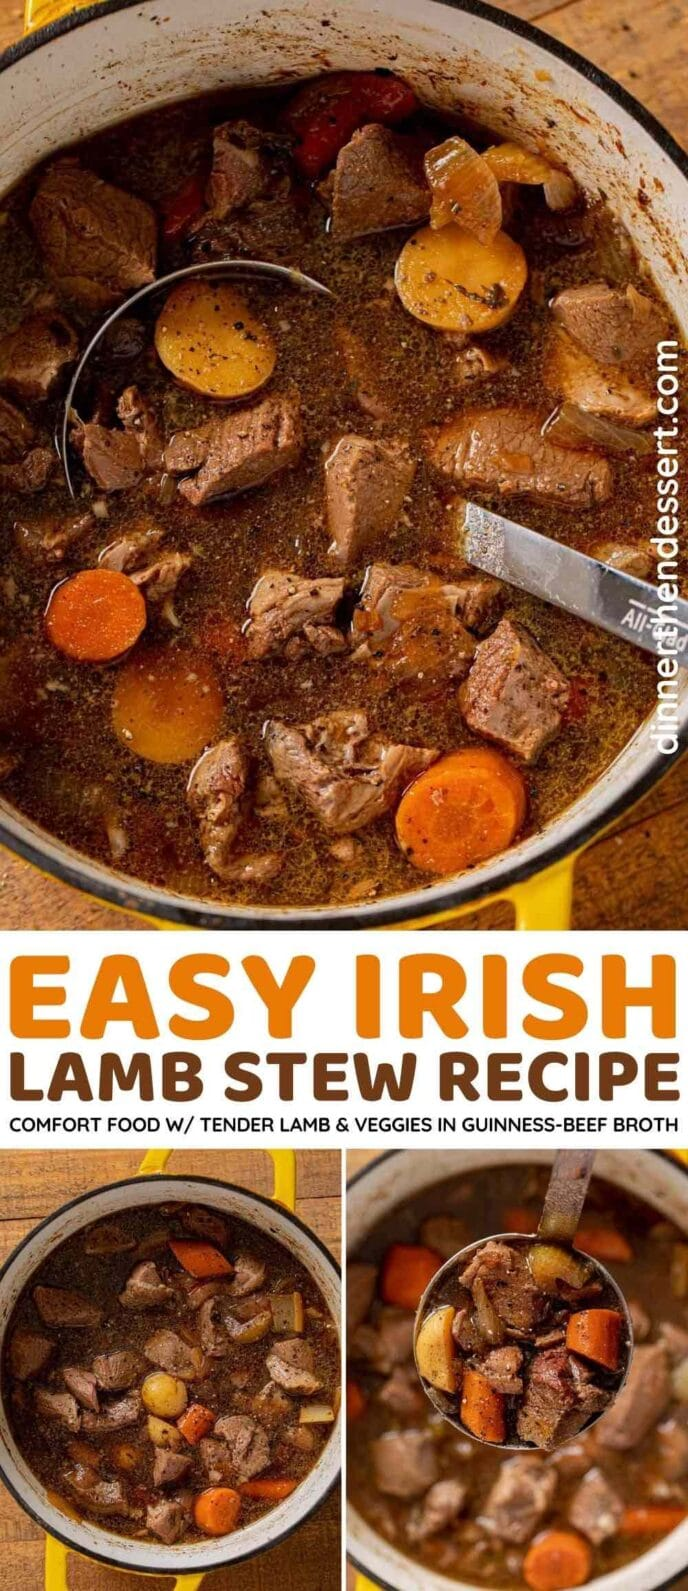 Easy Irish Lamb Stew